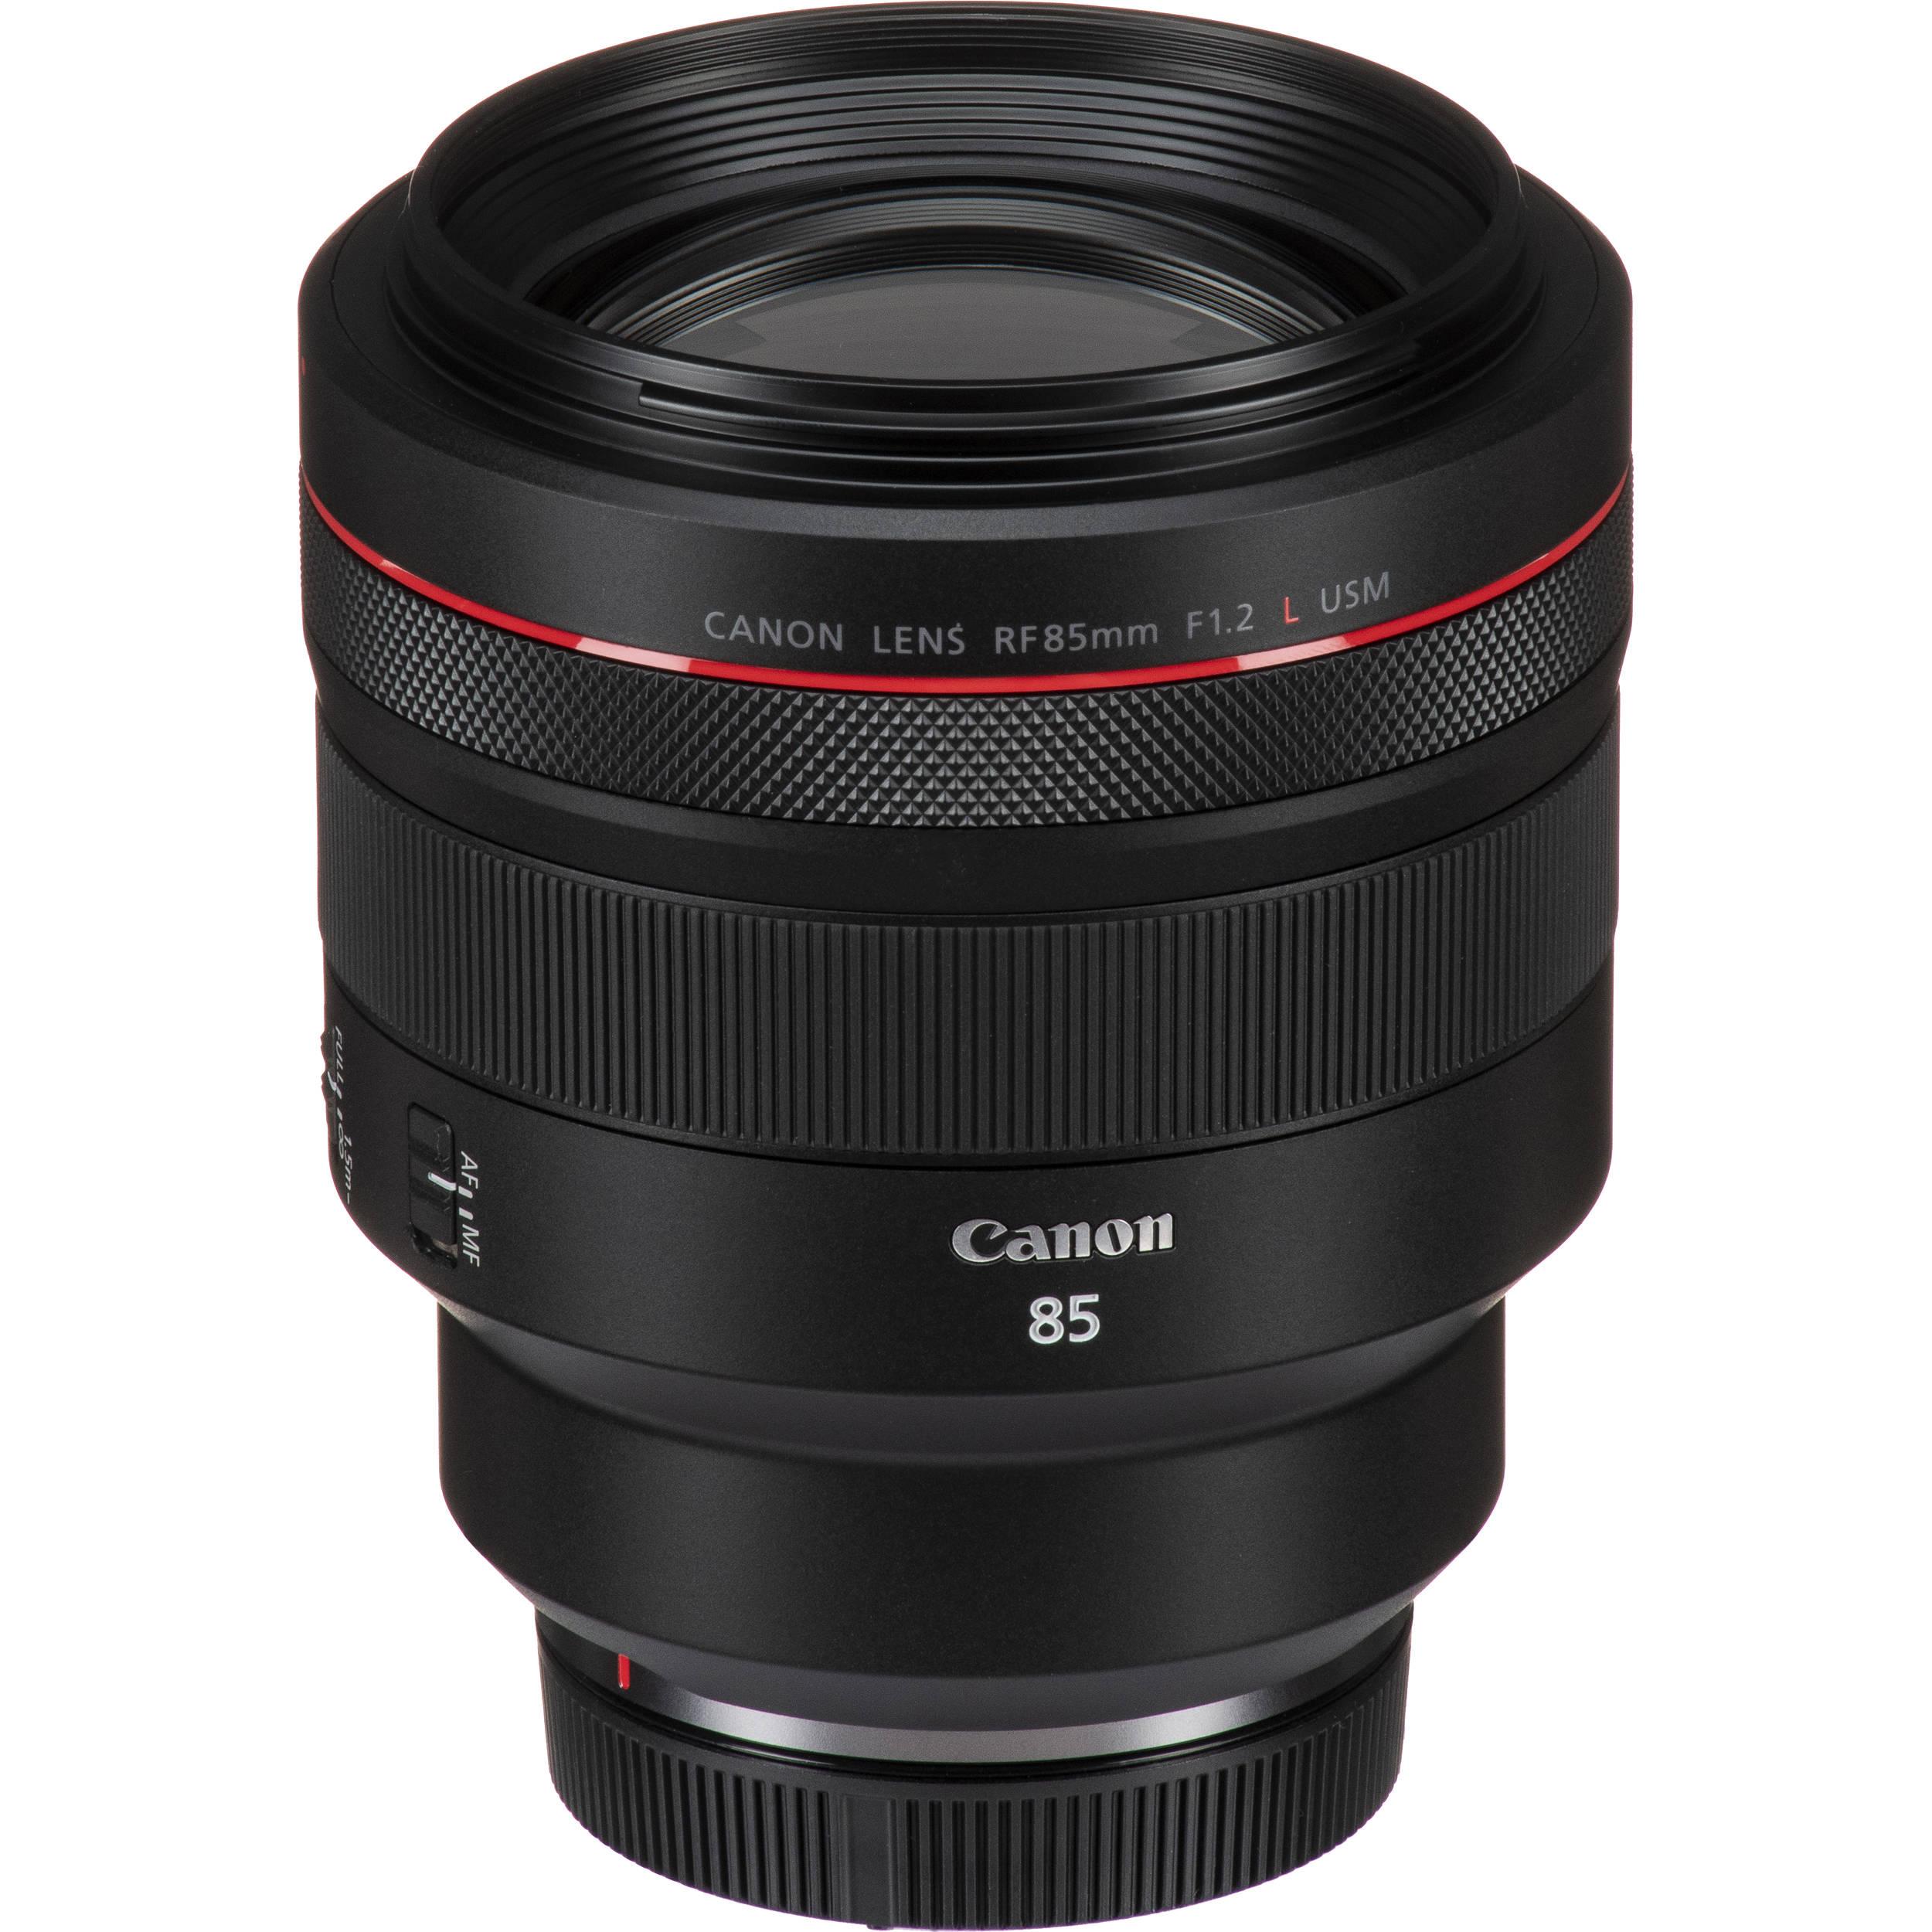 Canon RF 85mm f/1.2L USM Lens 3447C002 B&H Photo Video